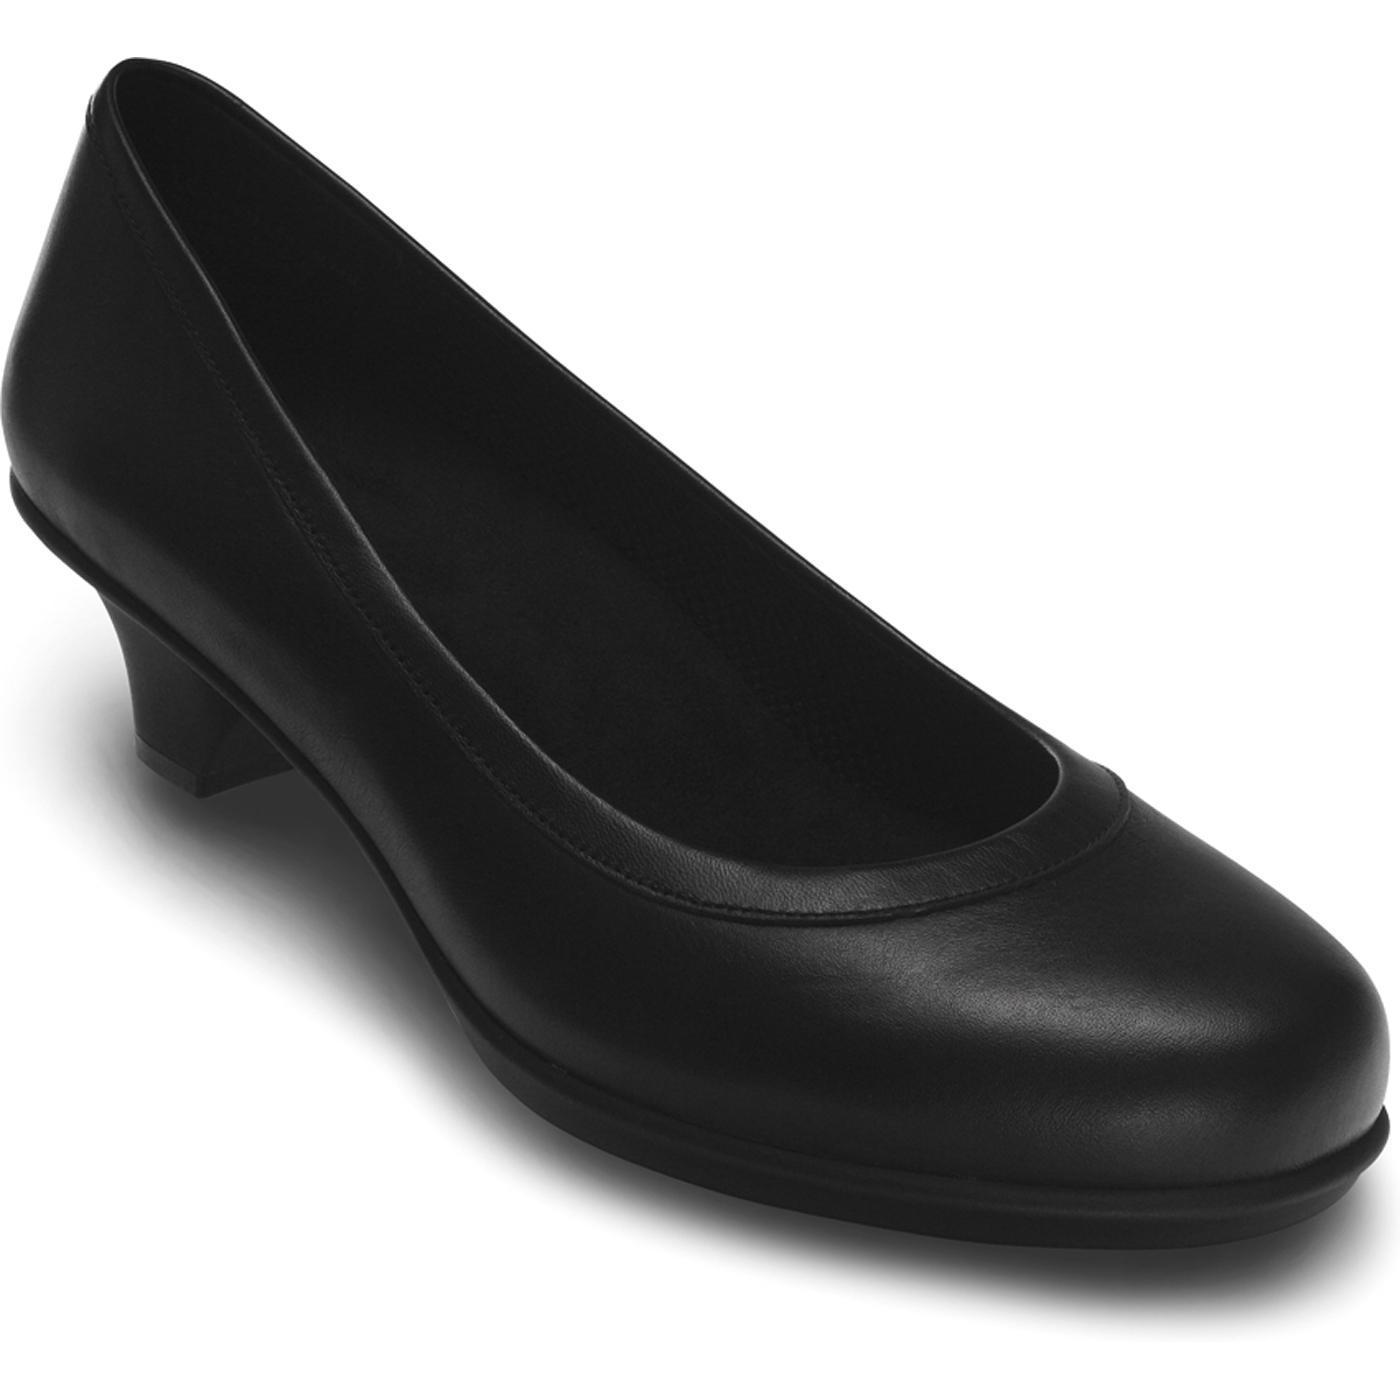 37a4db032a922 Crocs Women s Grace Heel Slip Resistant Pump